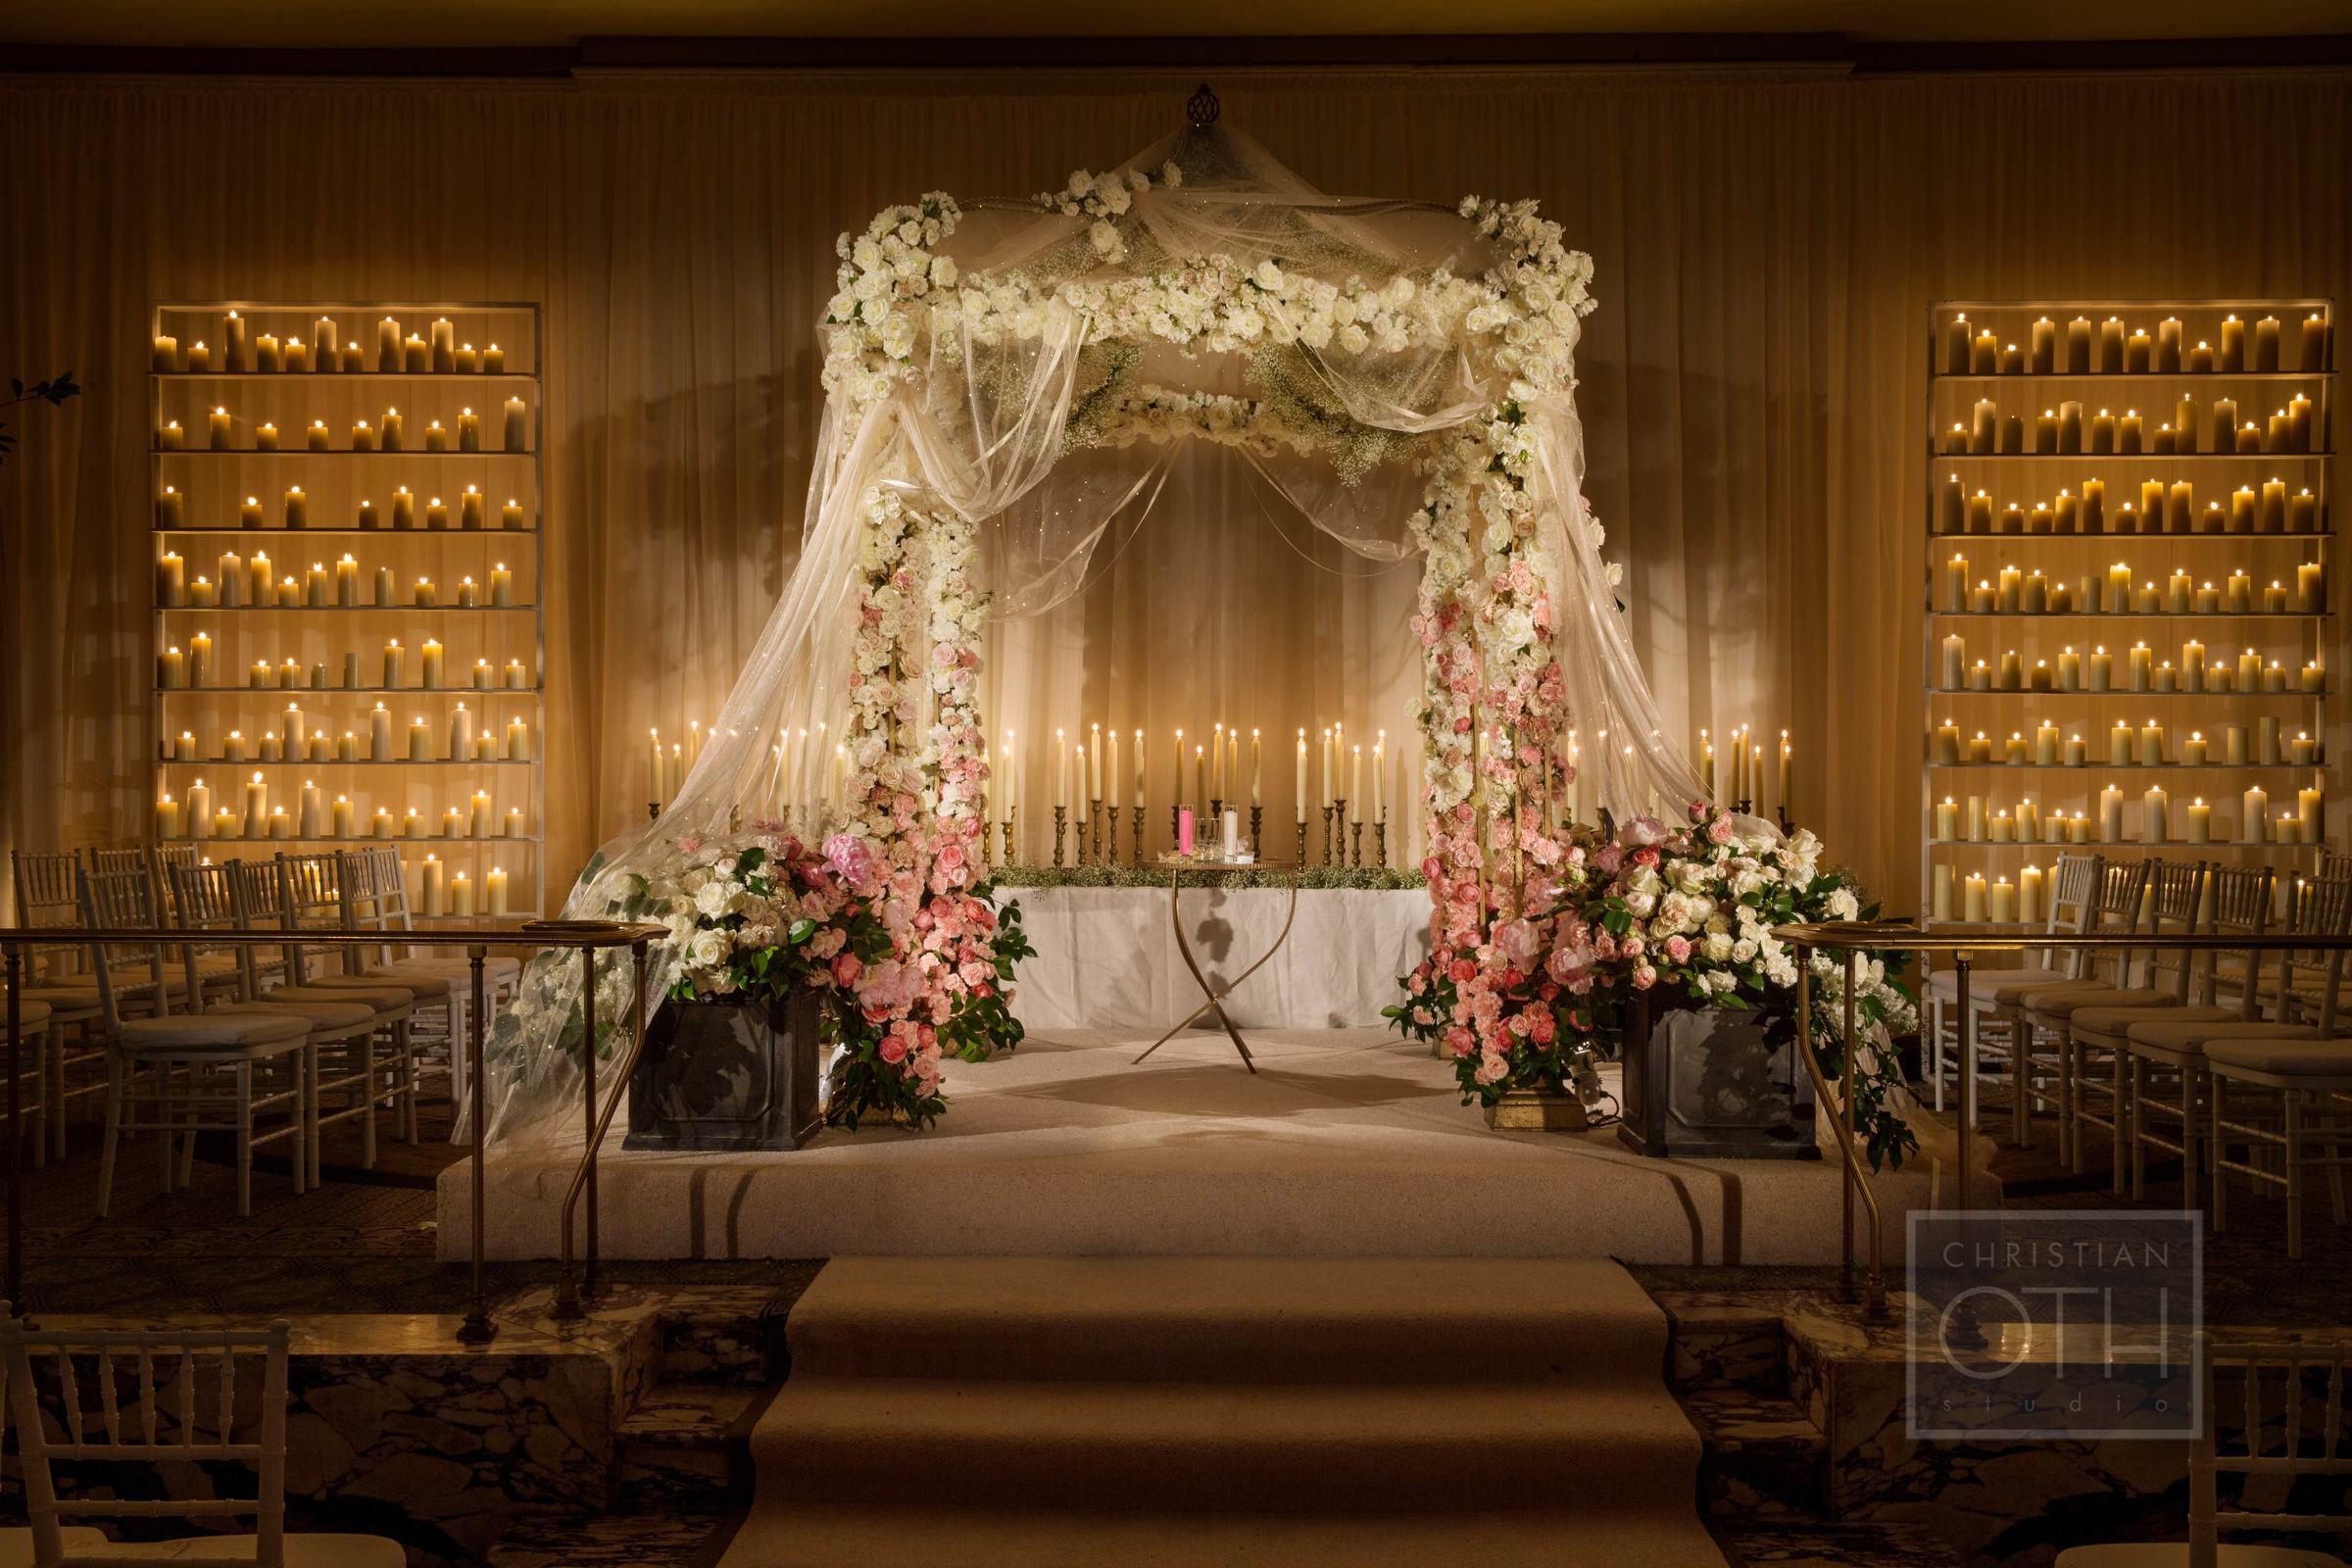 Ceci_New_York_Custom_Invitation_Pierre__City_ Destination_Wedding_Luxury_Personalized_Ceci_Style_Bride_Rose_Gold_Foil_Stamping82.JPG